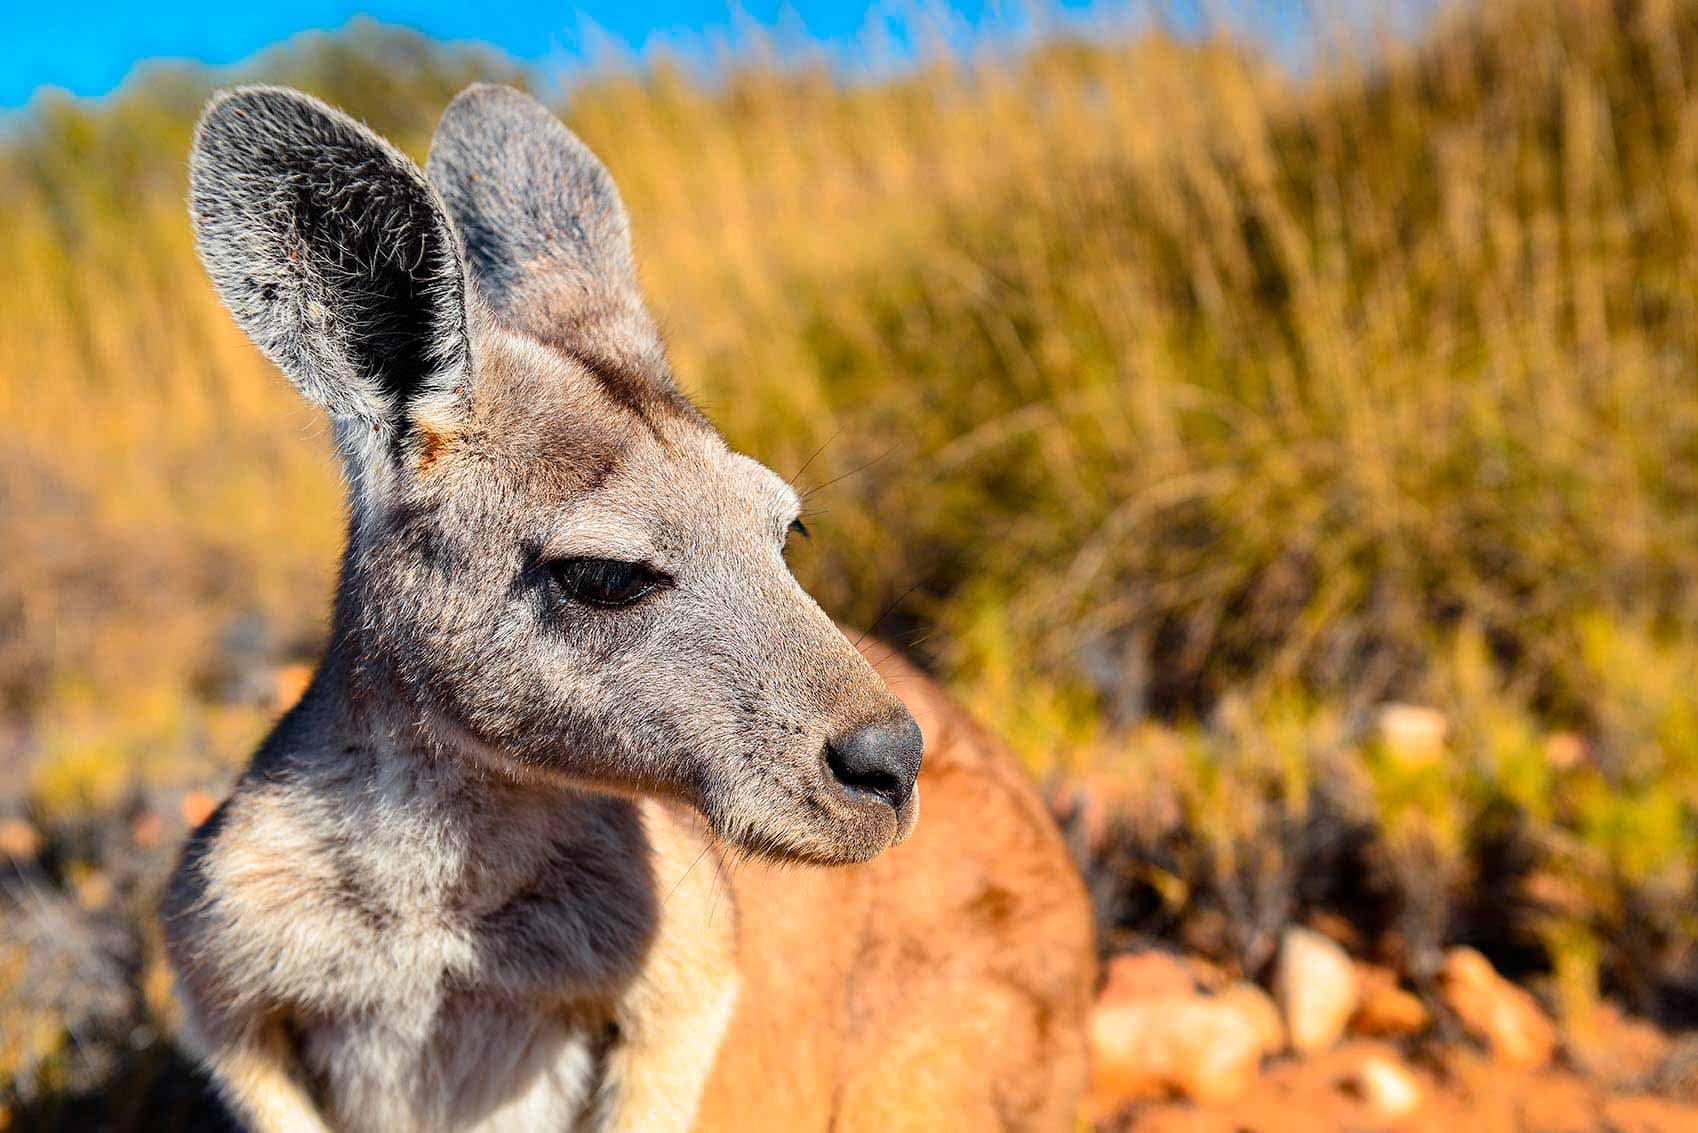 robin favier australia australie kangaroo kangourou animaux animals nature sauvage wildlife outback bush